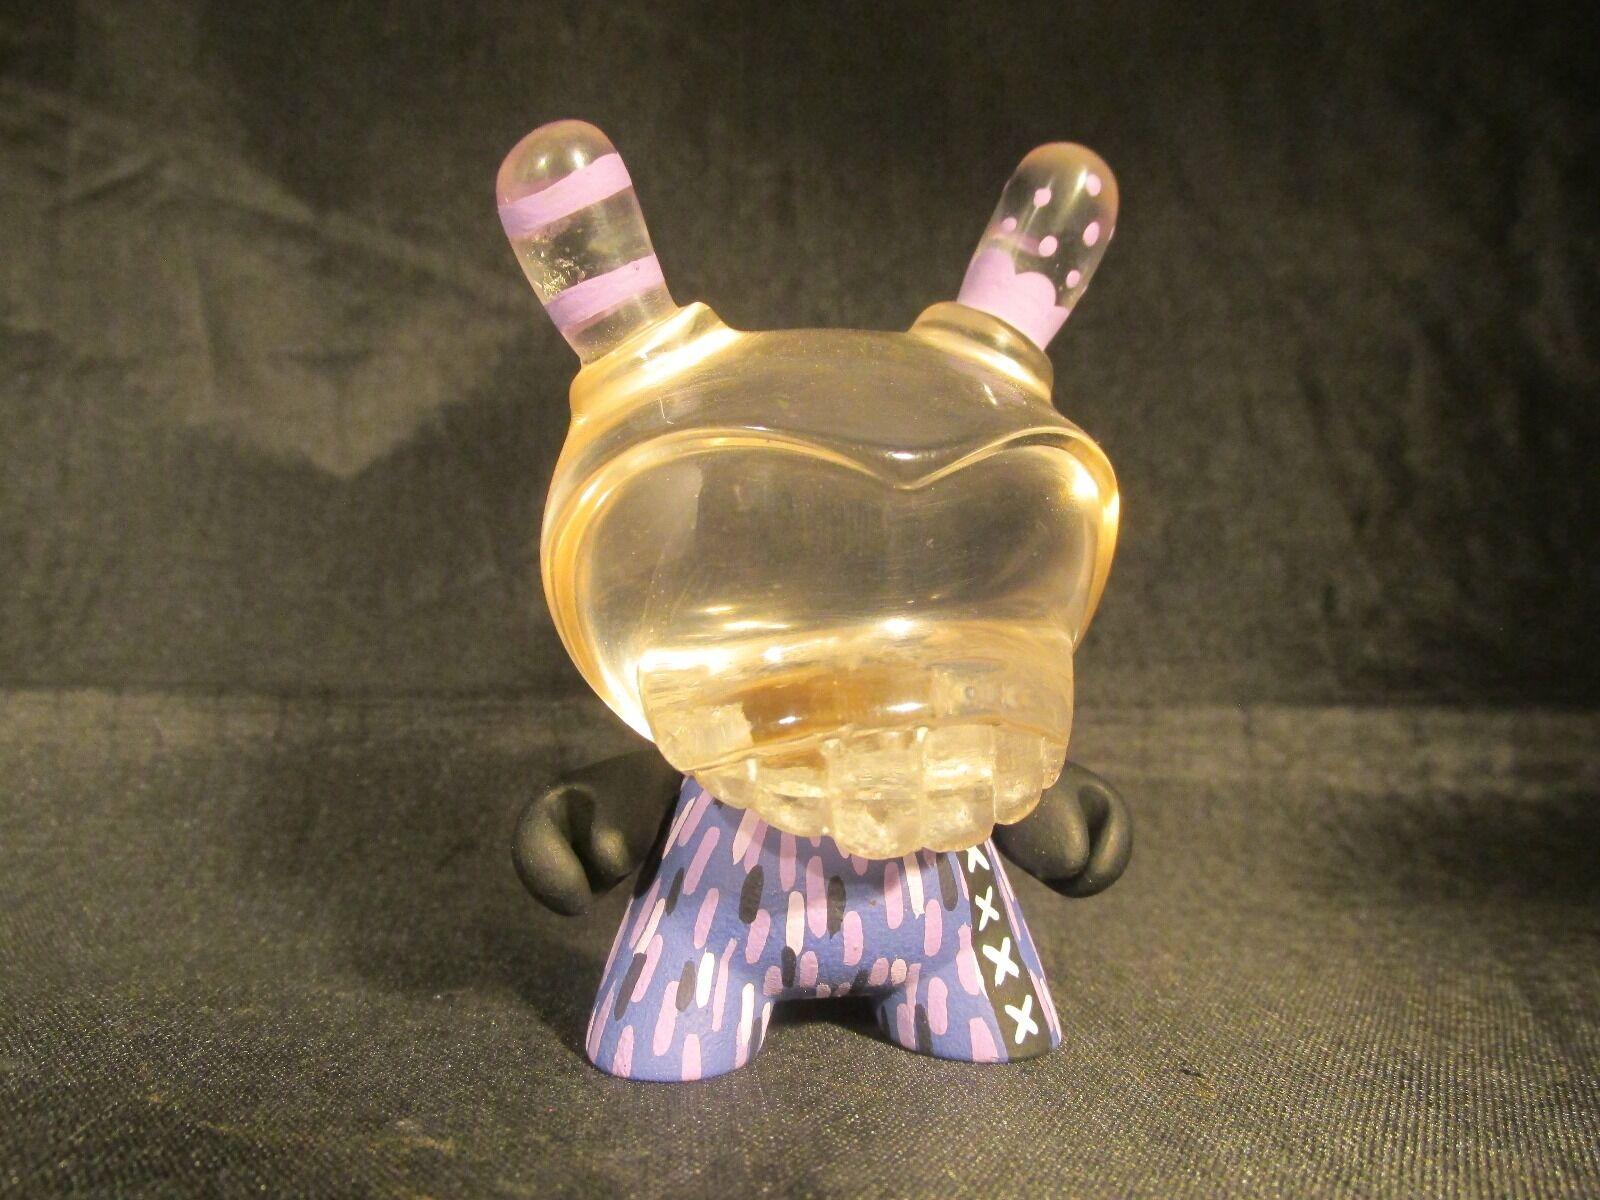 Personalizado 3  Kidrobot agente K Dunny por Rsin cabeza de resina transparente 1 1 Raro Exclusivo PUR